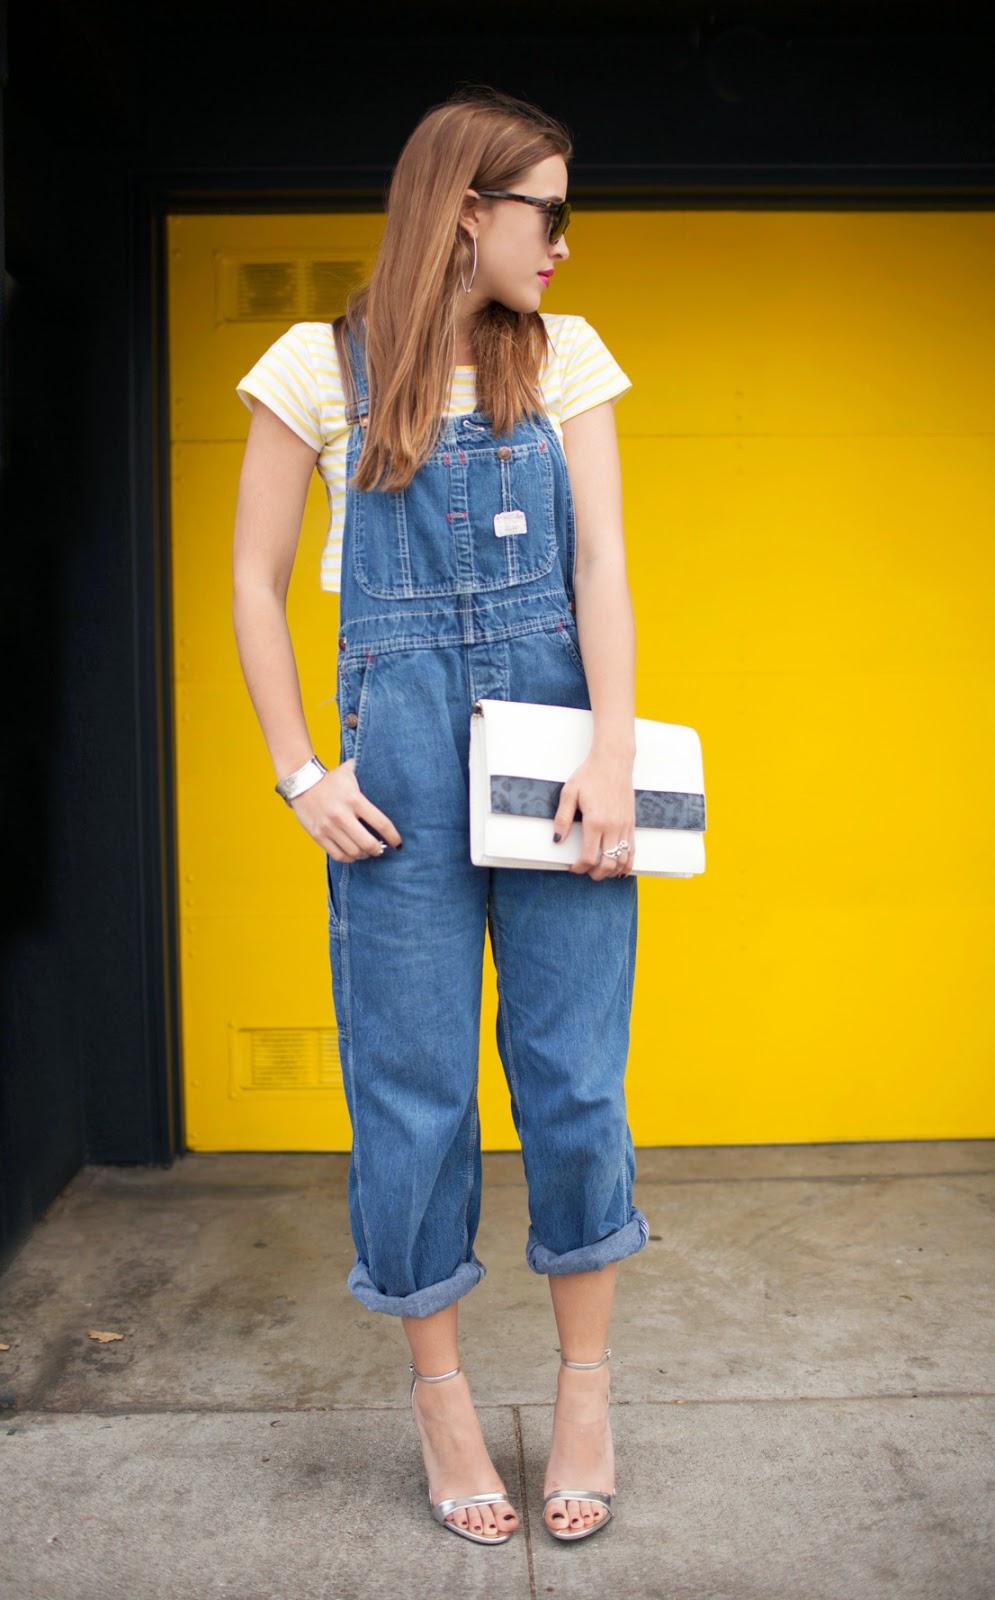 overalls and crop tops